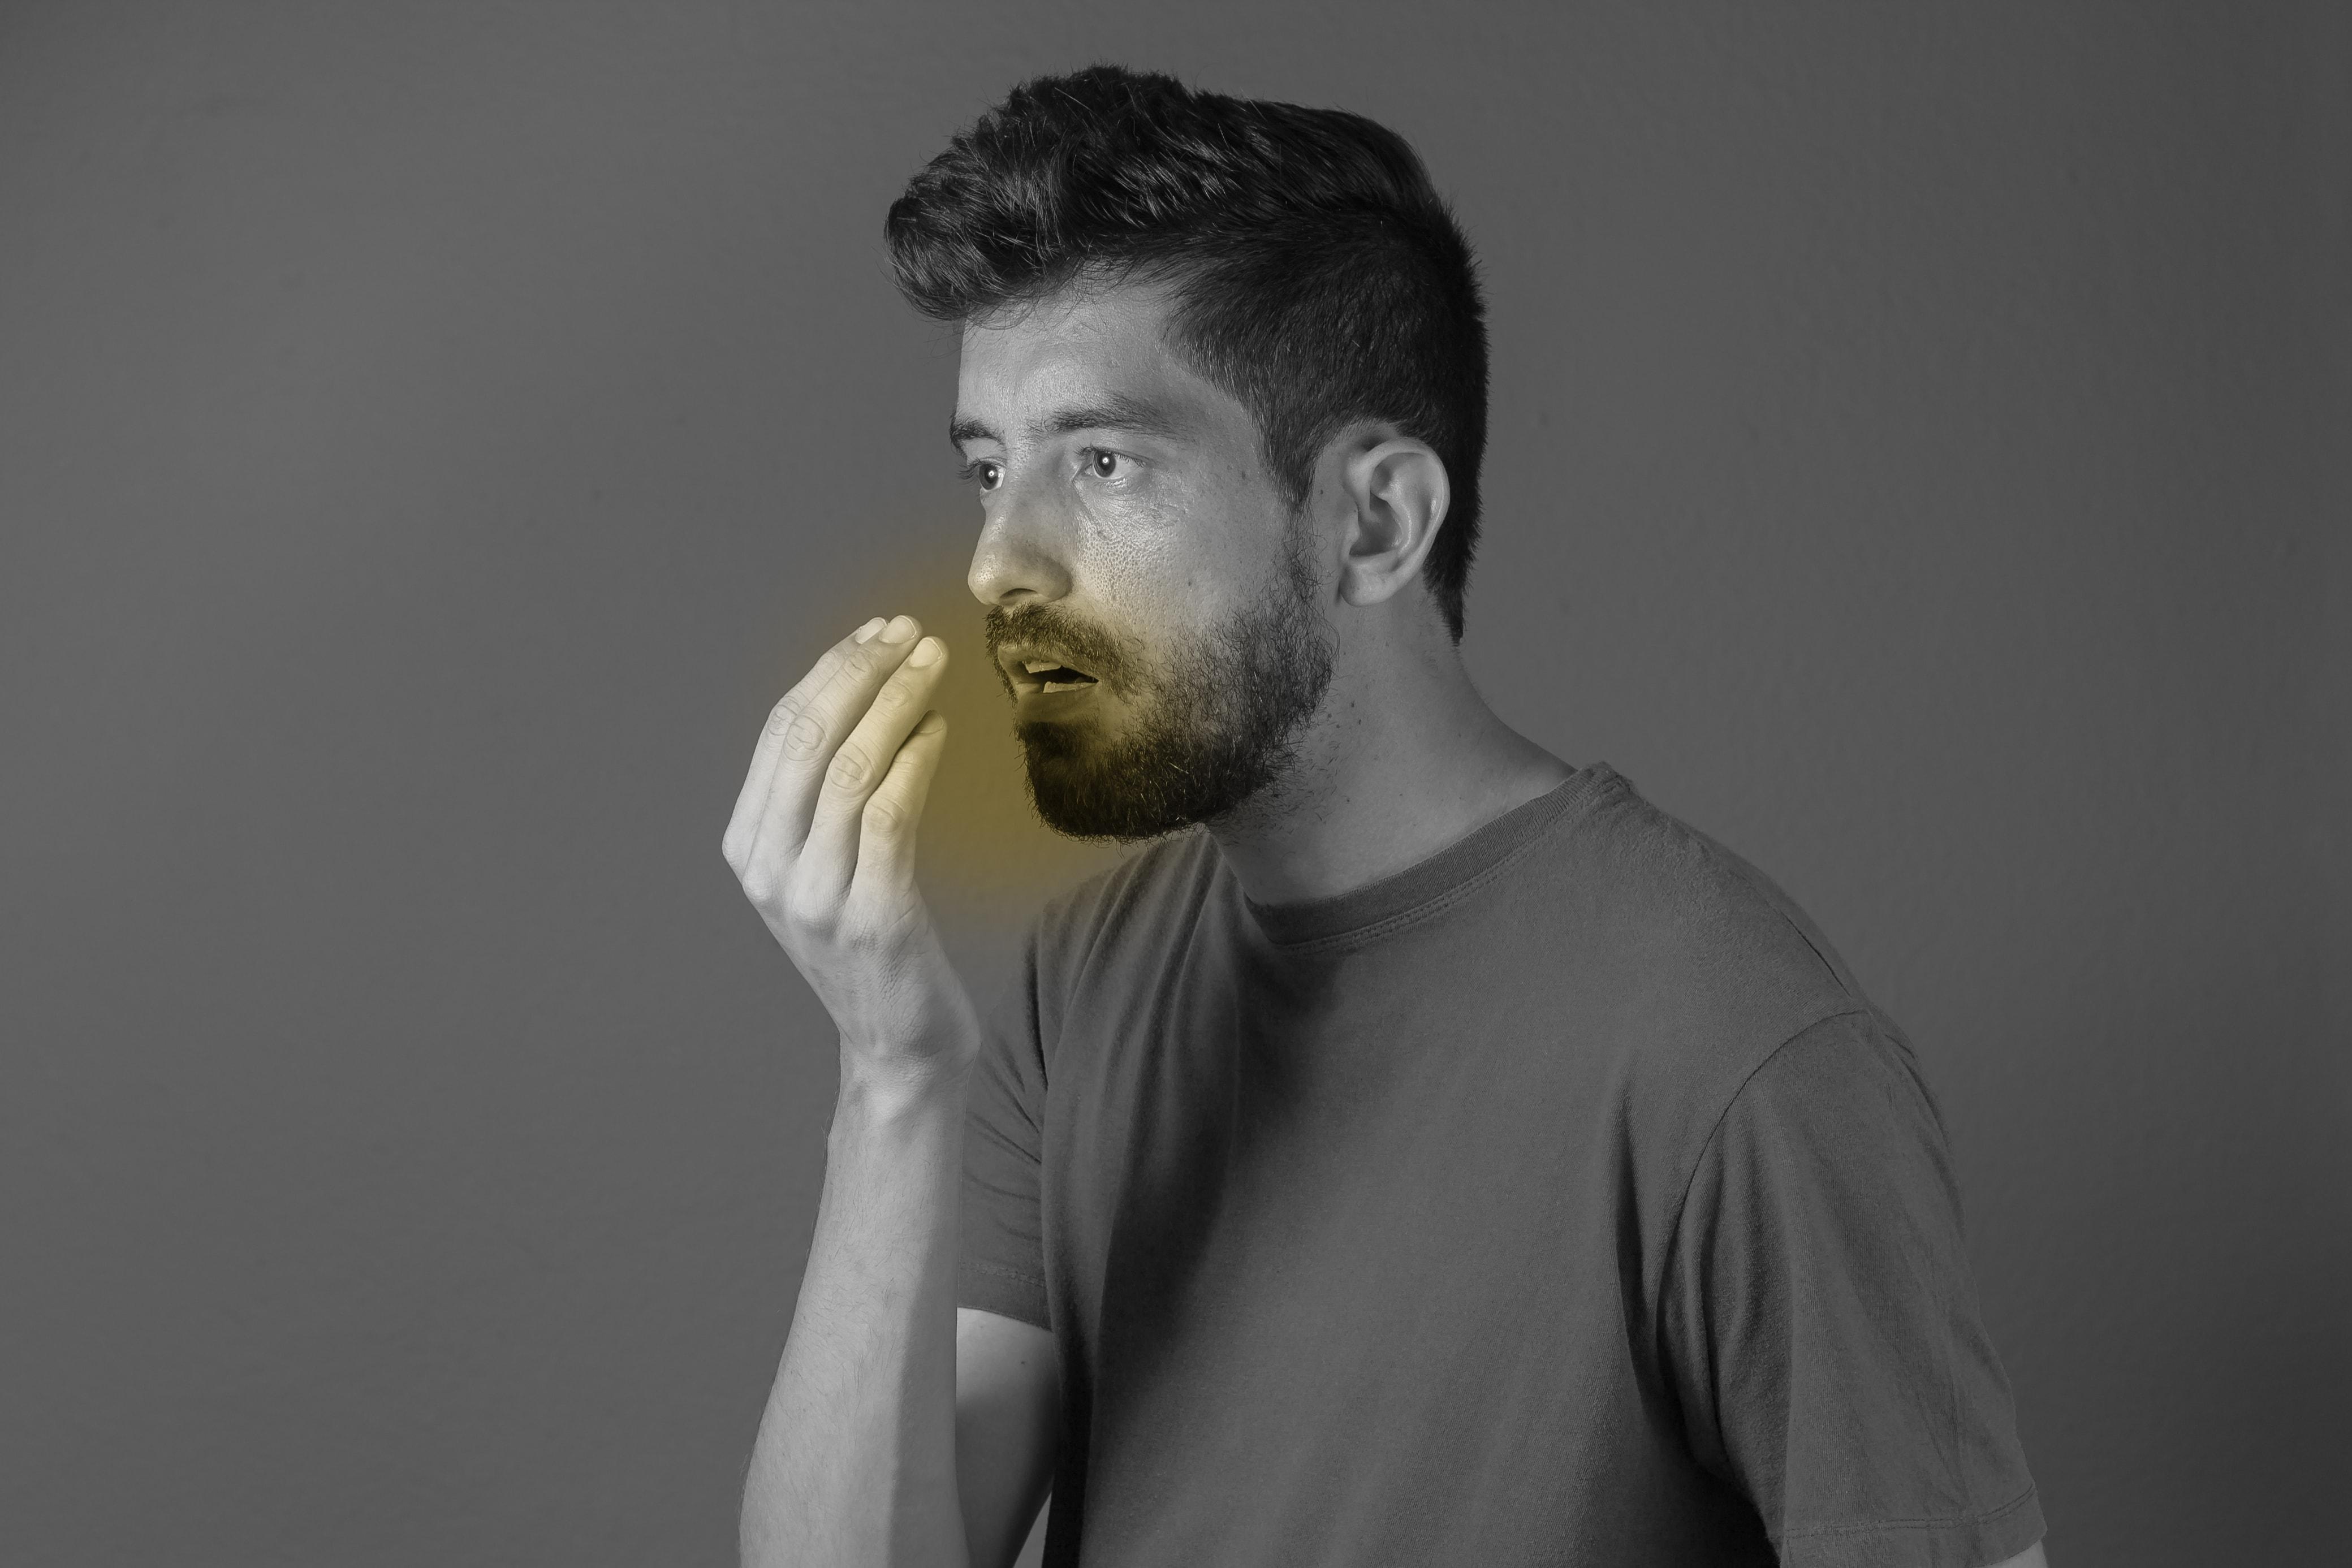 Bad Breath Halitosis Causes Amp Treatments